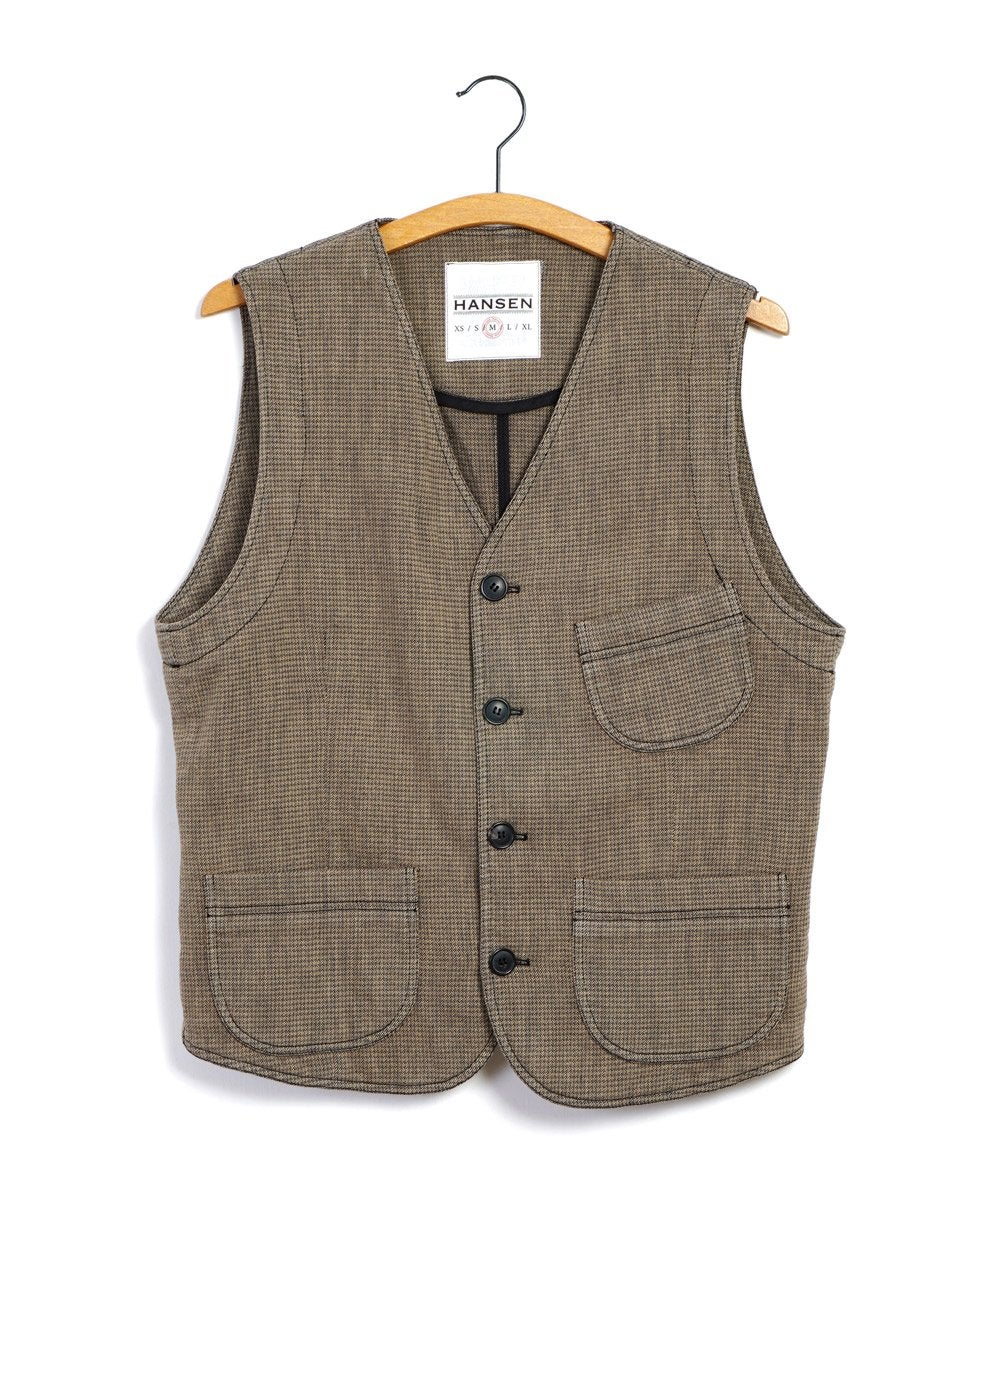 Hansen Garments HARALD | Casual Waistcoat | Lion